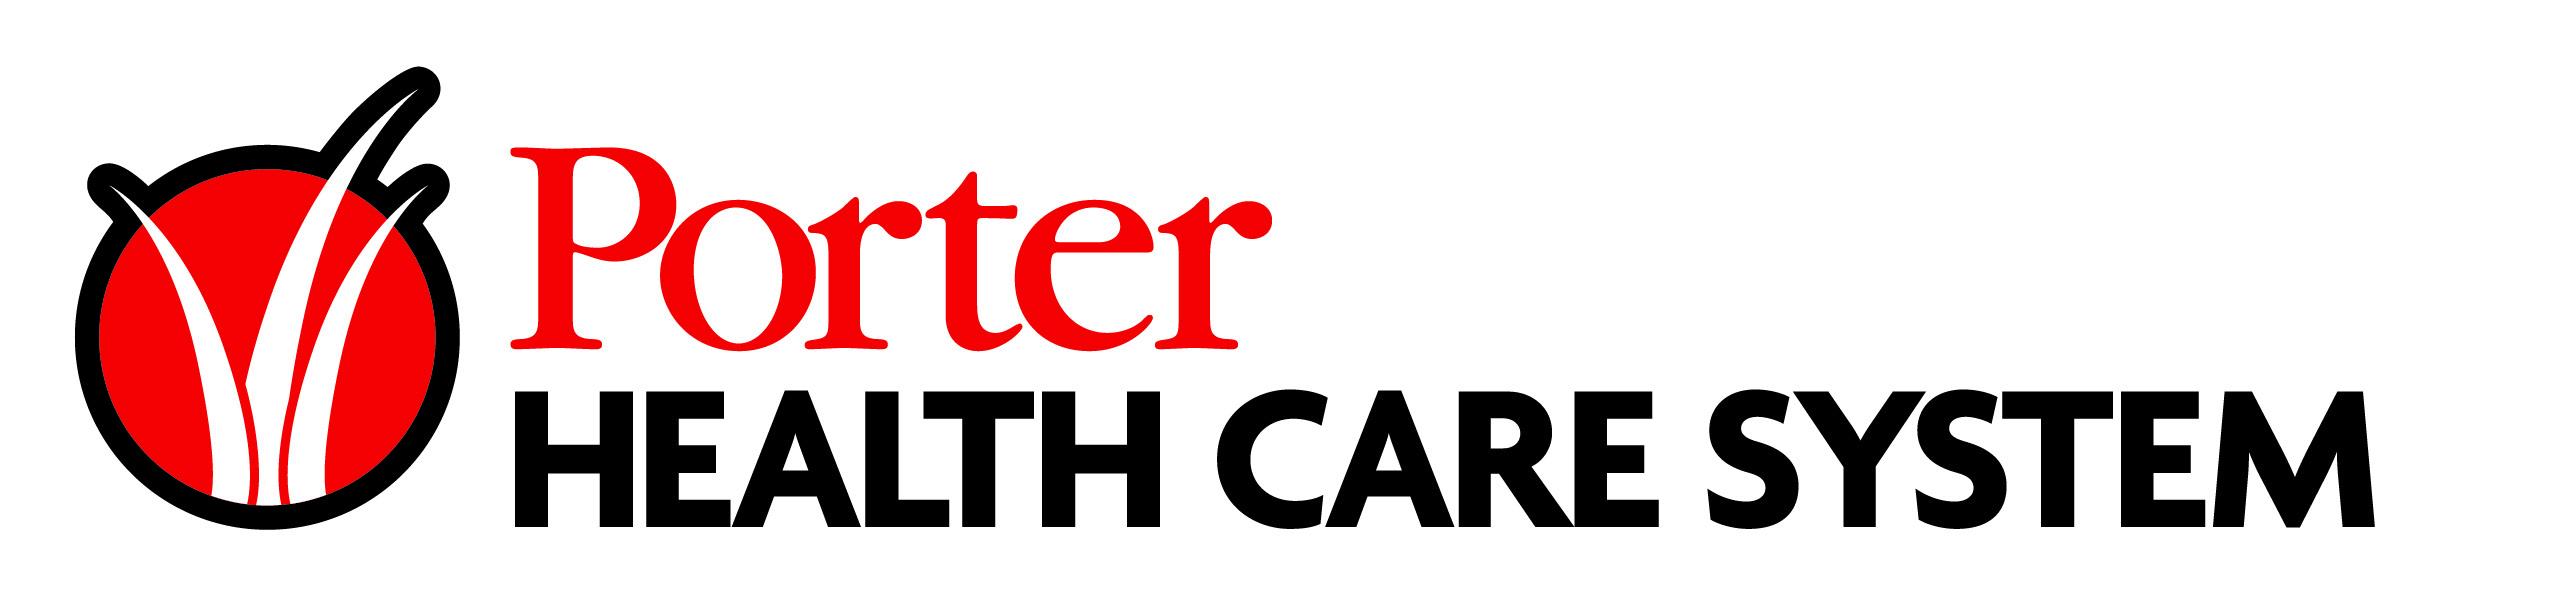 Porter Health